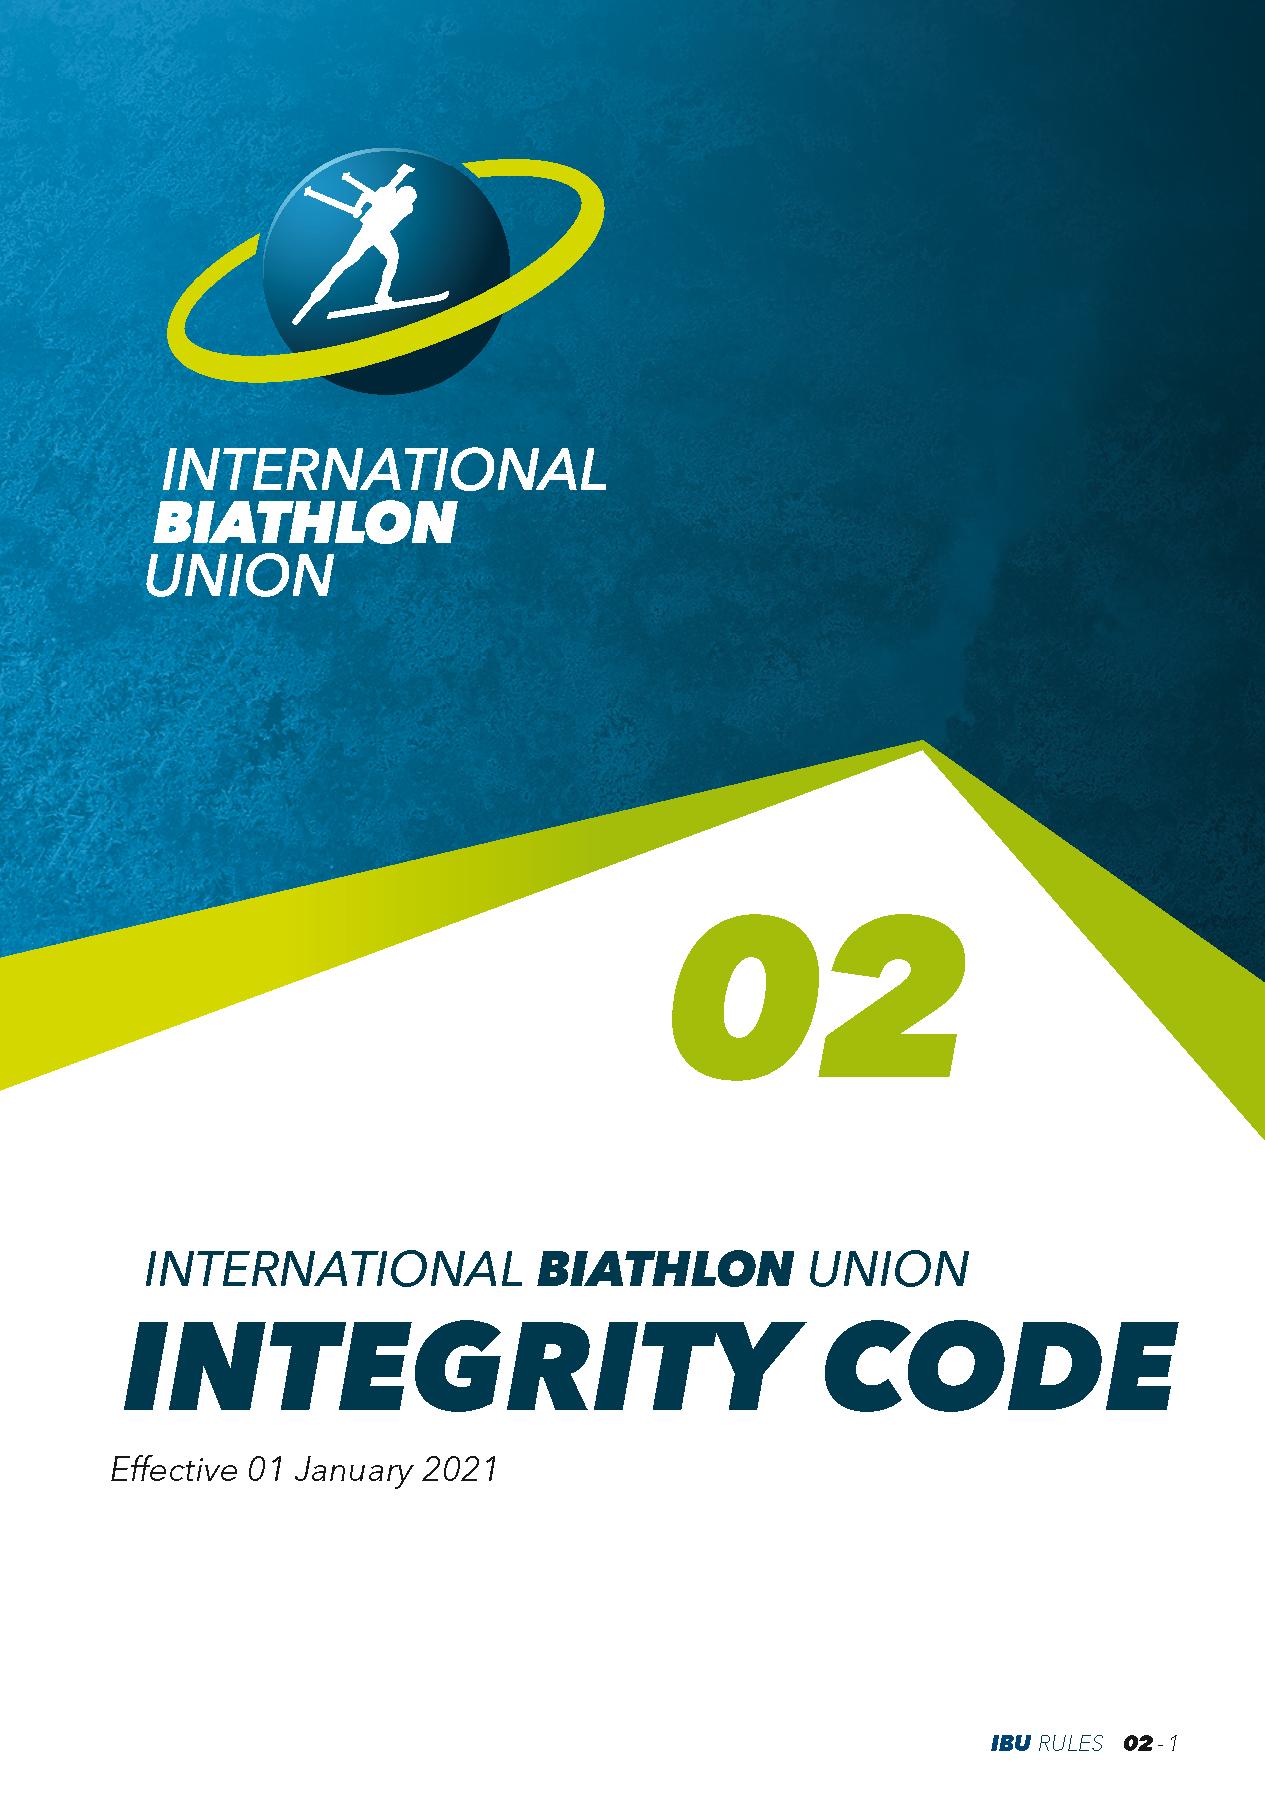 International Biathlon Union (IBU) Integrity Code